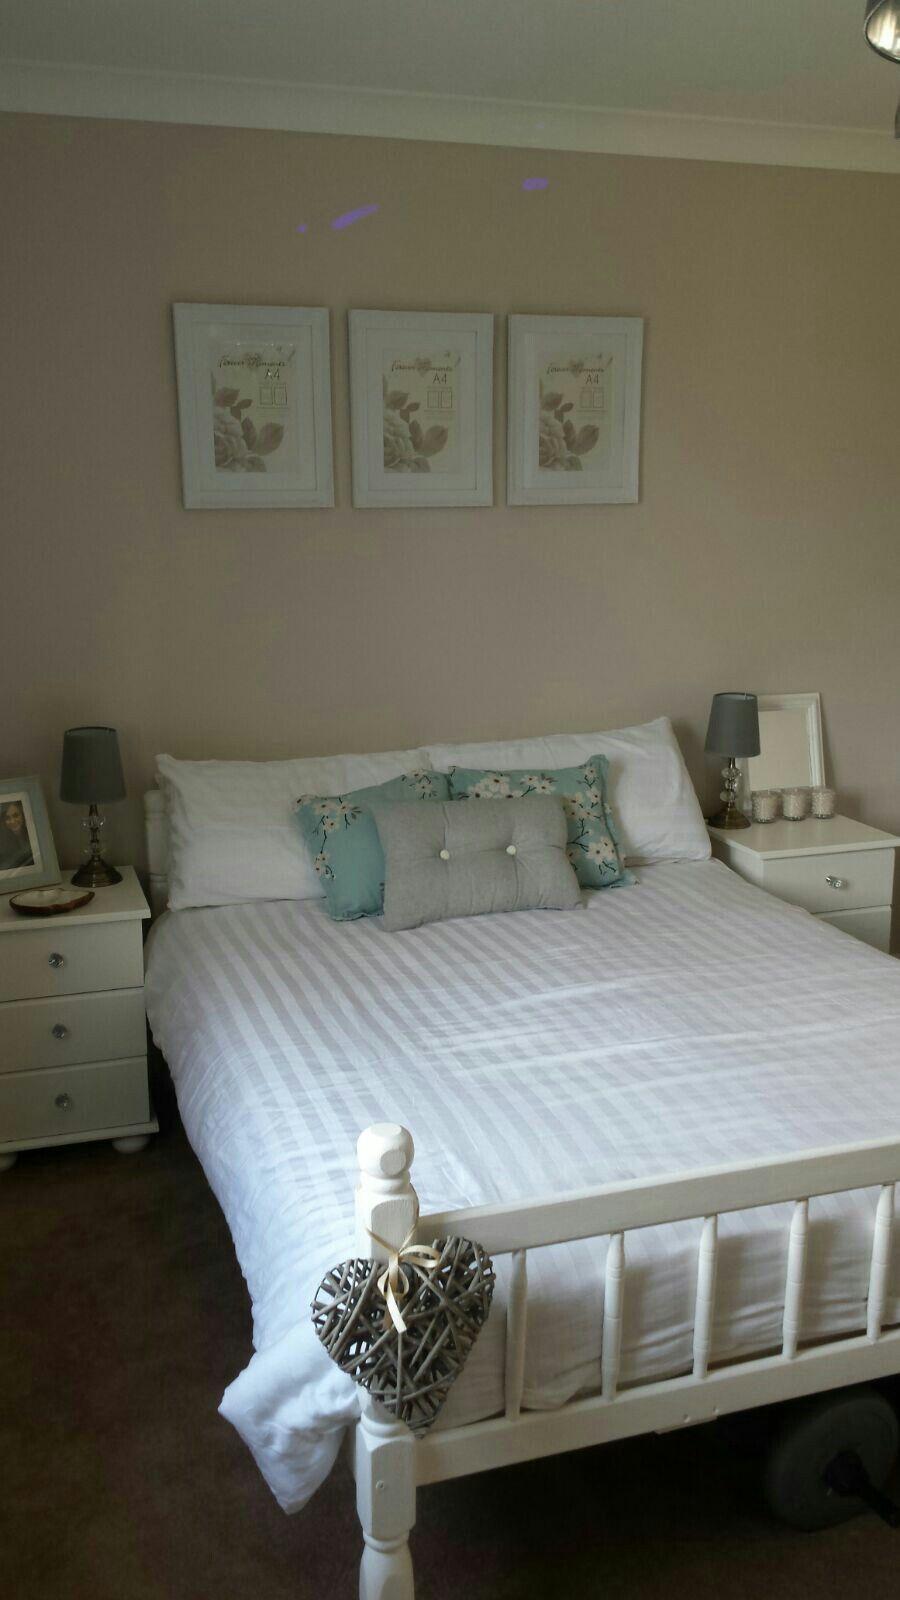 Dulux Gentle Fawn Bedroom Bed Design Dulux Gentle Fawn